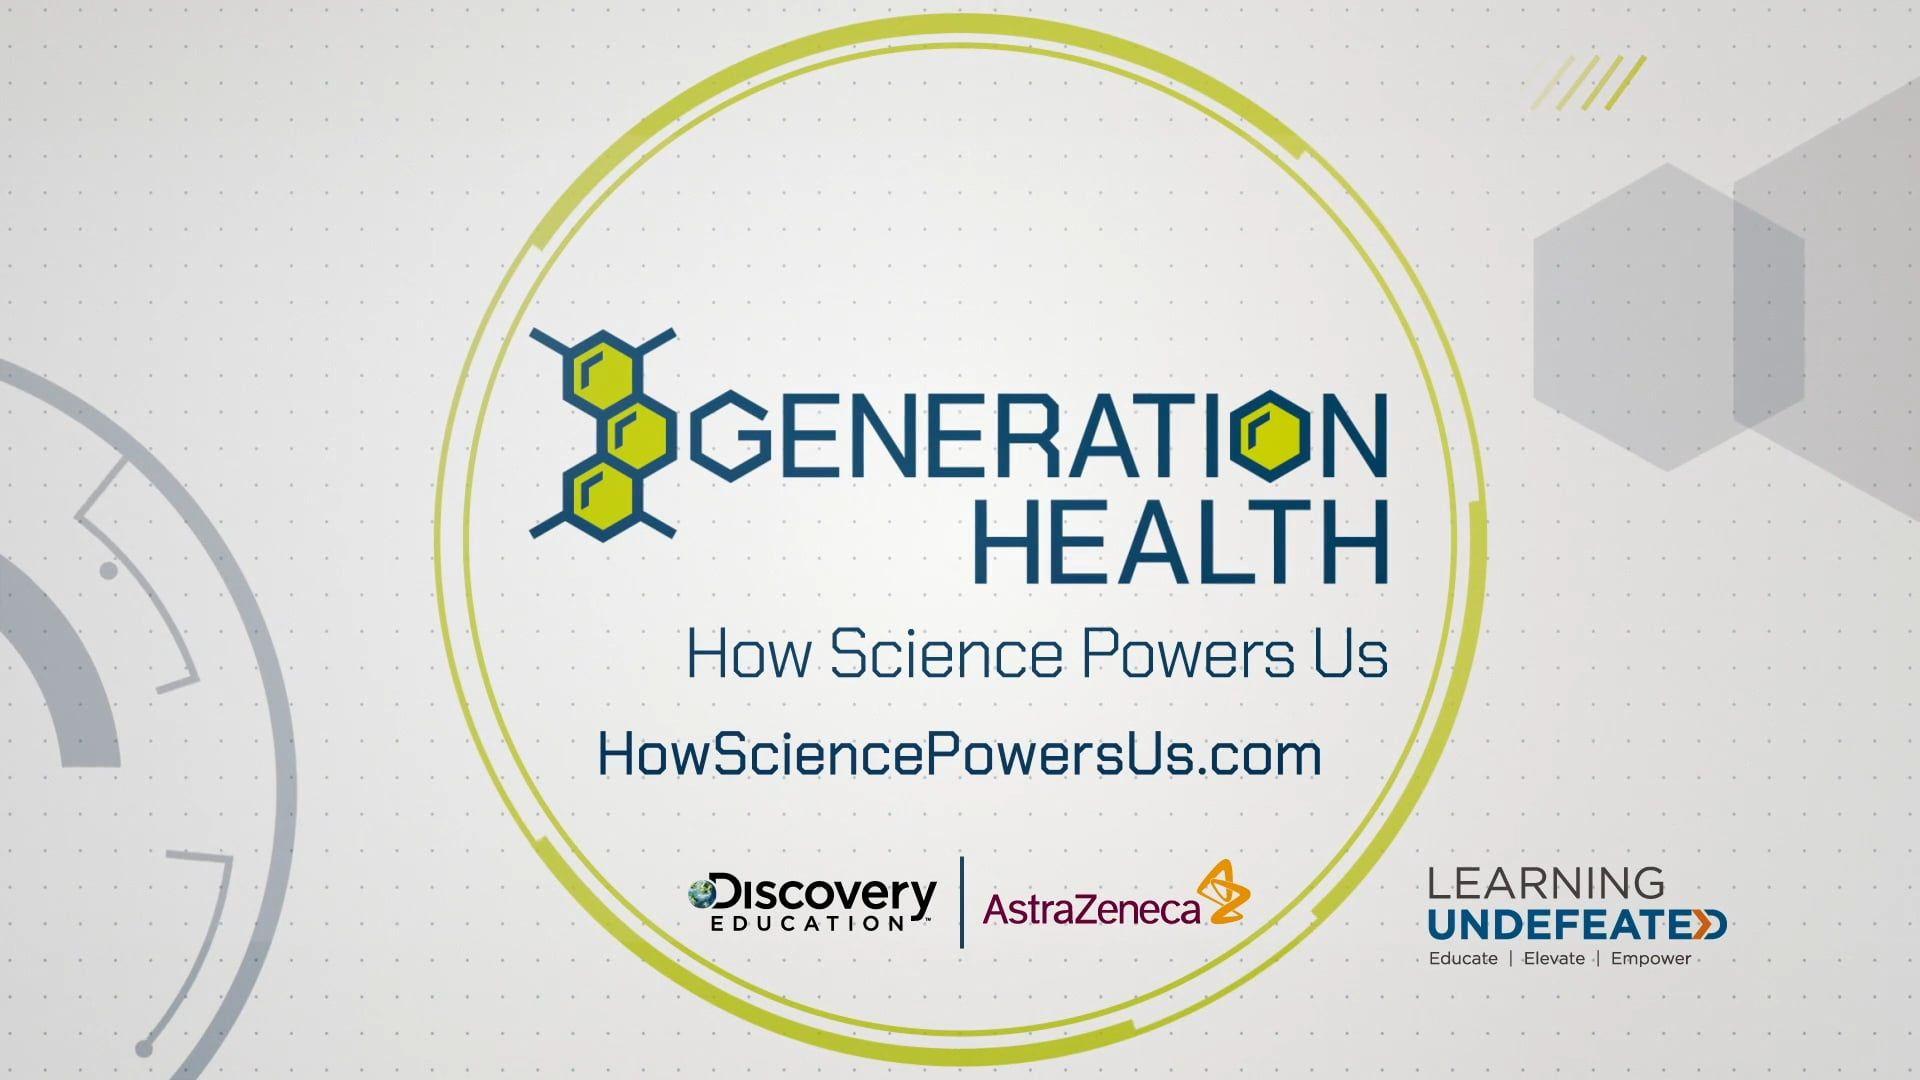 Astrazeneca Generation Health Virtual Field Trip Full In 2020 Virtual Field Trips Field Trip Right To Education